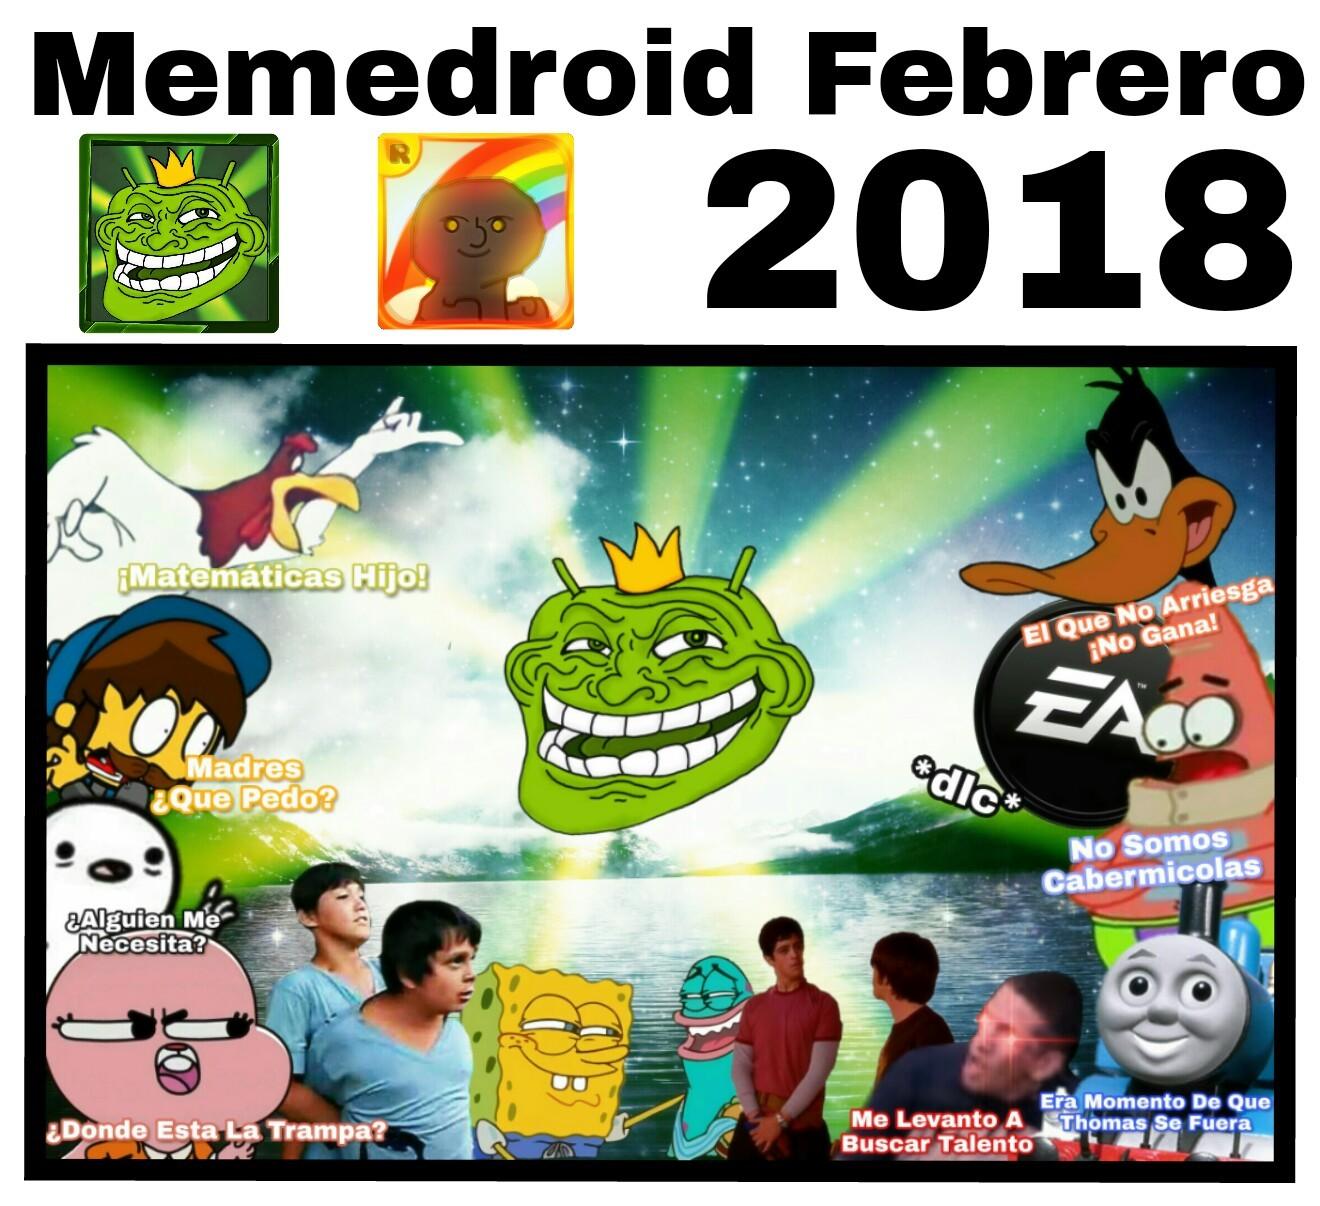 Memedroid Febrero